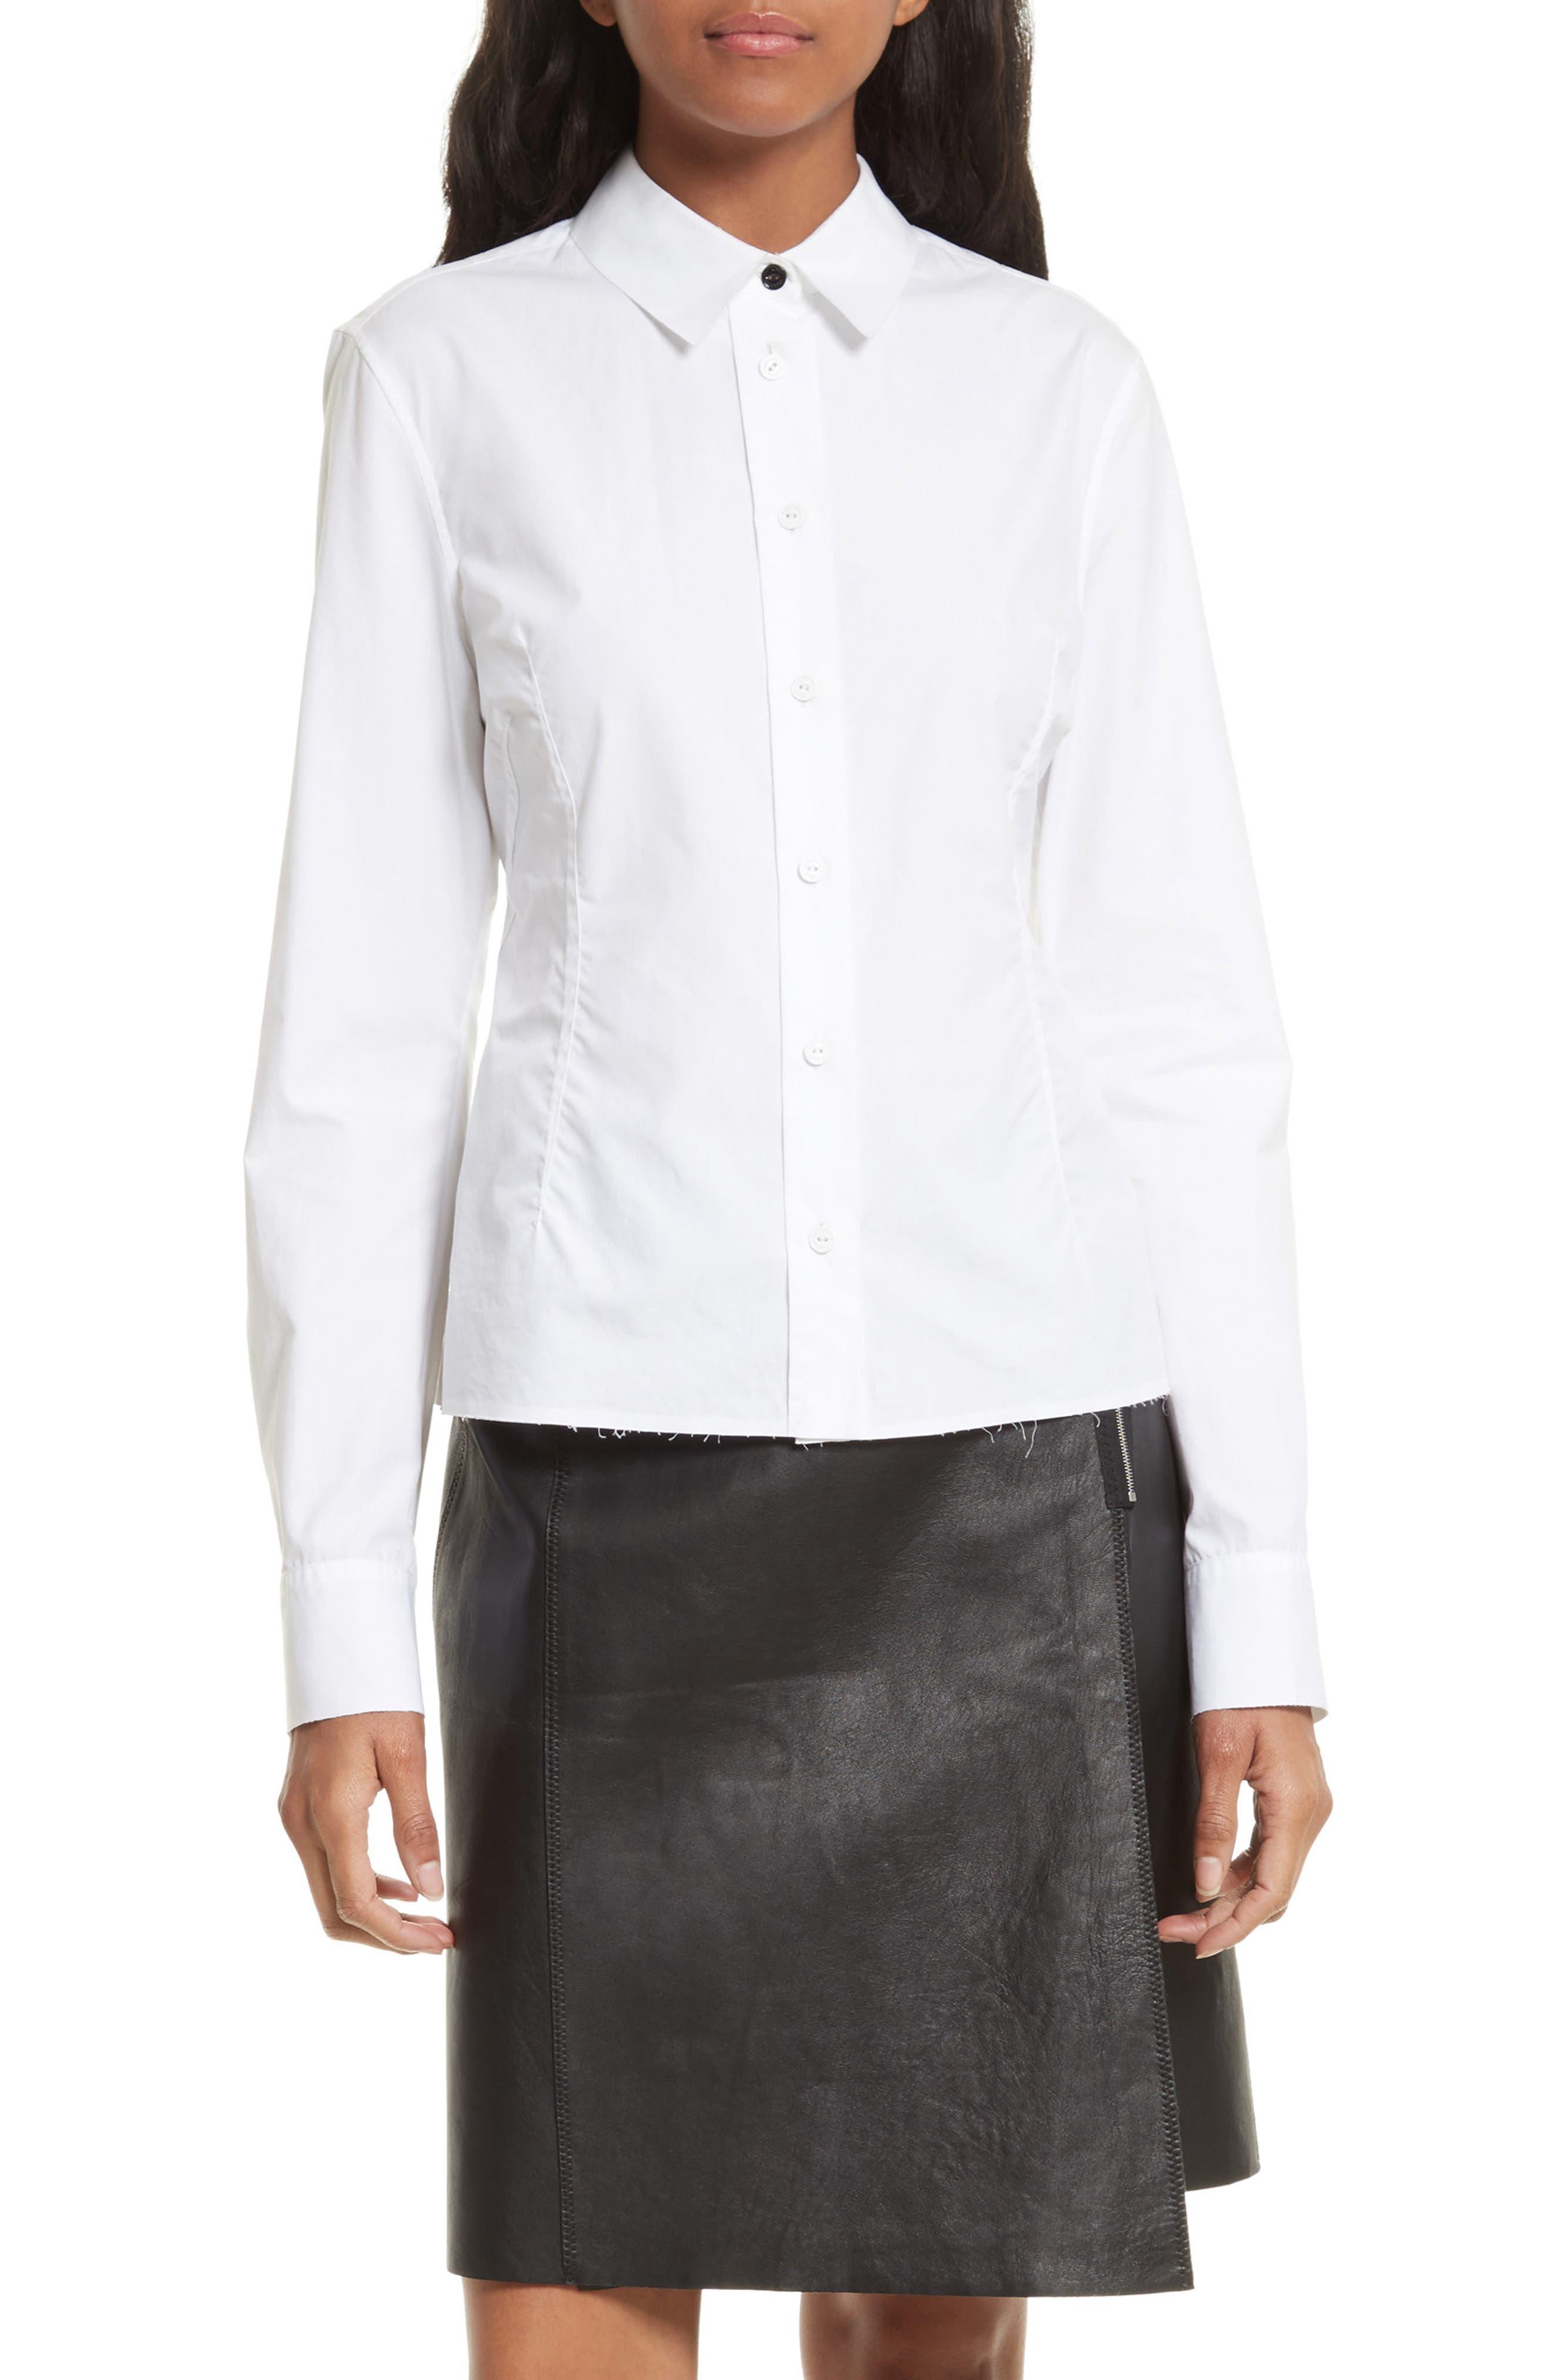 Alternate Image 1 Selected - rag & bone Albion Shirt